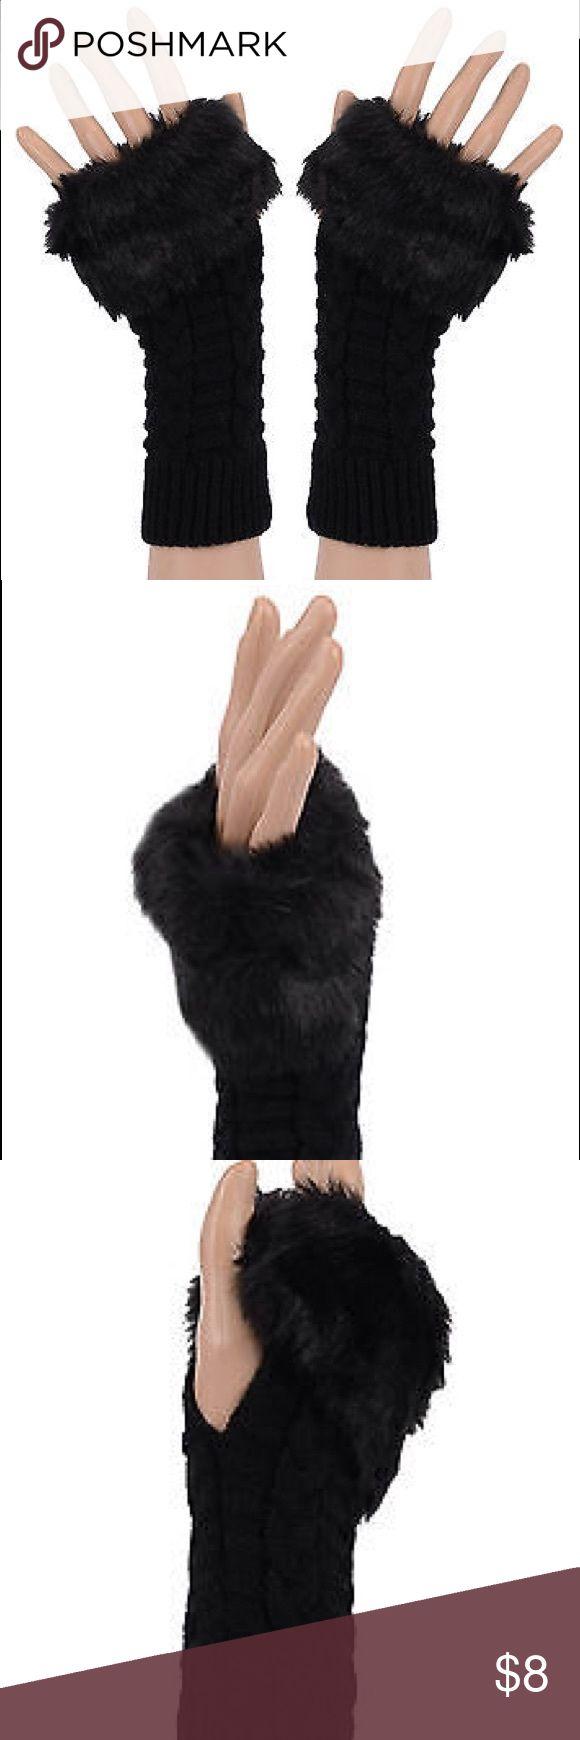 best 25+ best winter gloves ideas on pinterest | best winter